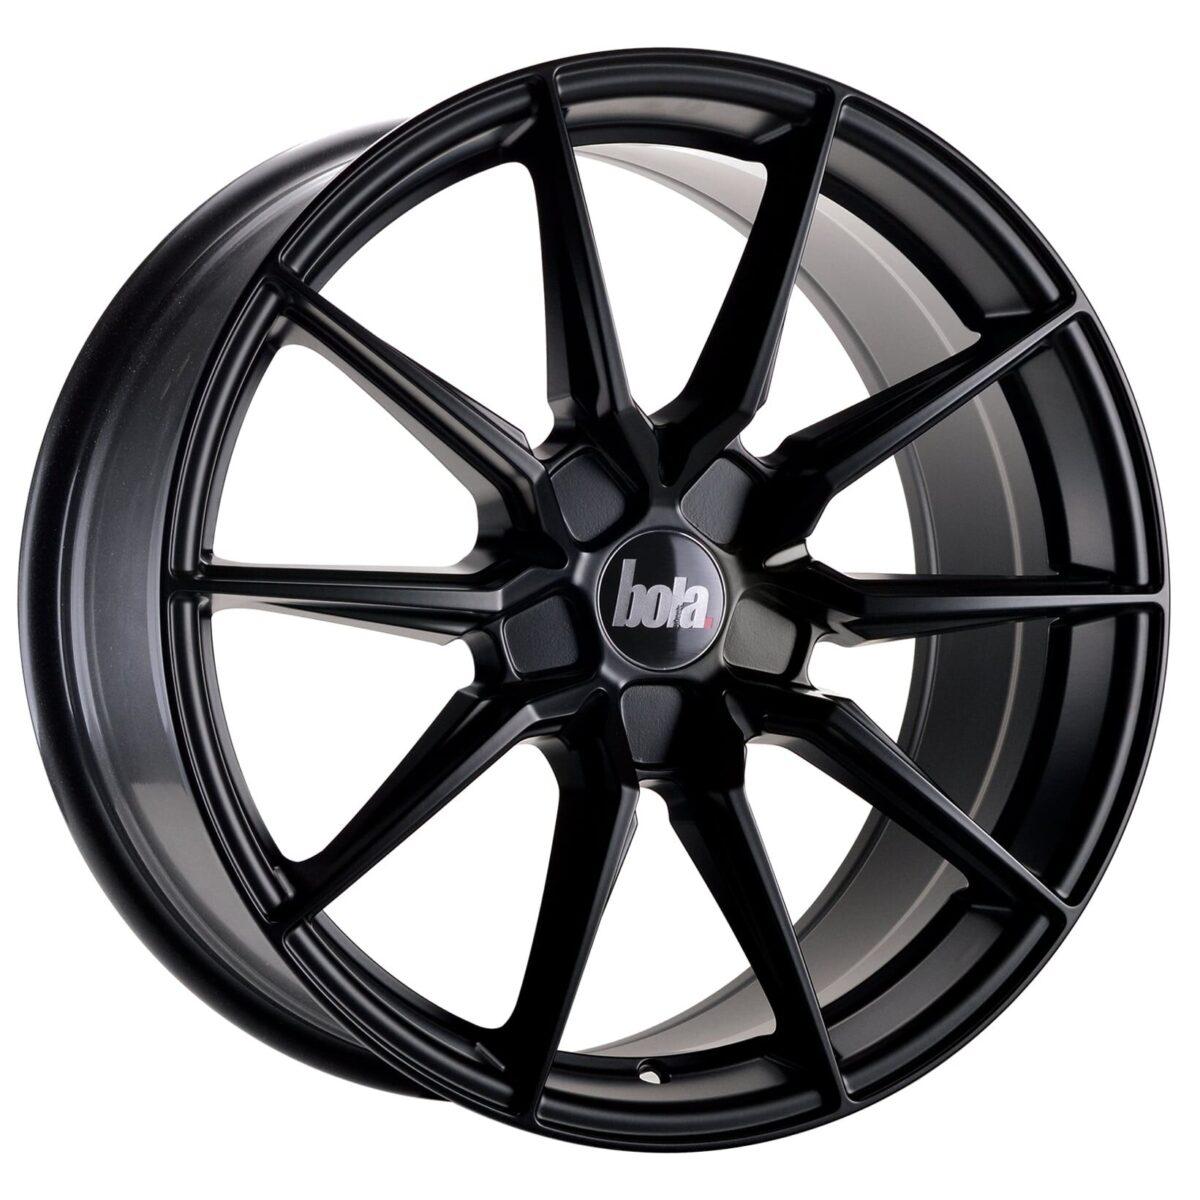 "19"" BOLA B16 Wheels - Matt Black - All BMW Models"